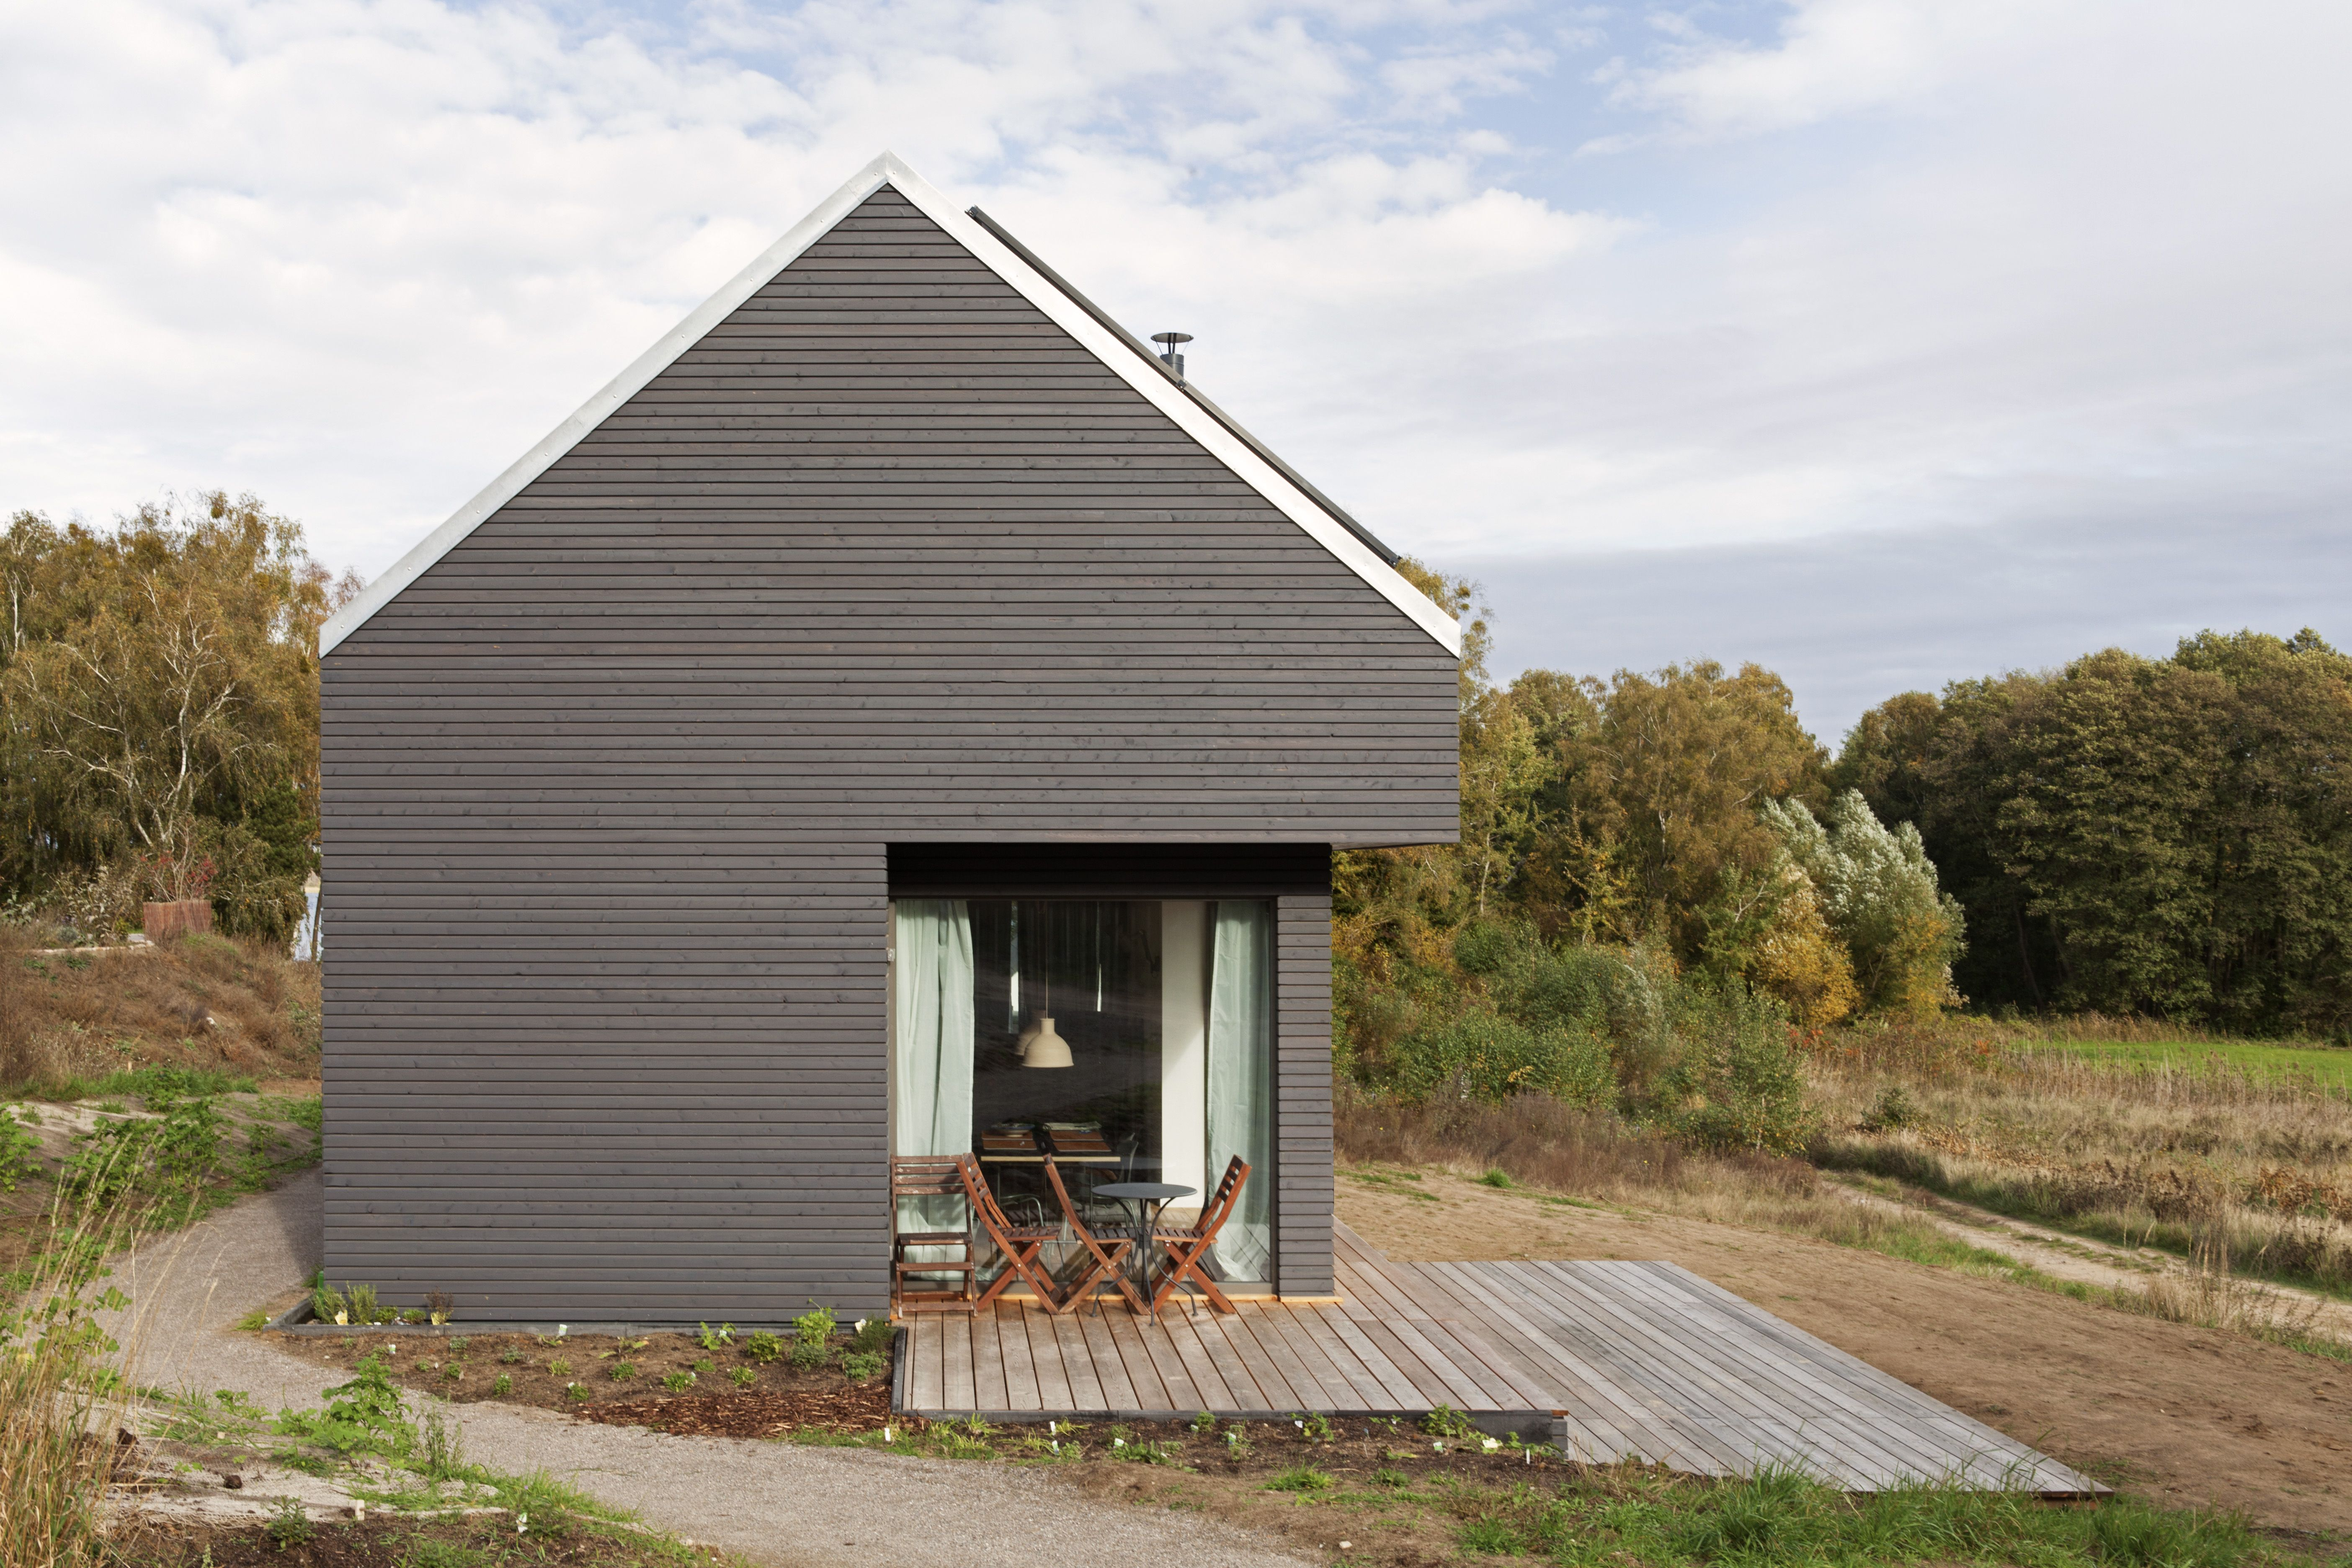 Sommerhaus Piu Haus Wustrow In 2020 Sommerhaus Haus Immobilien Wohnung